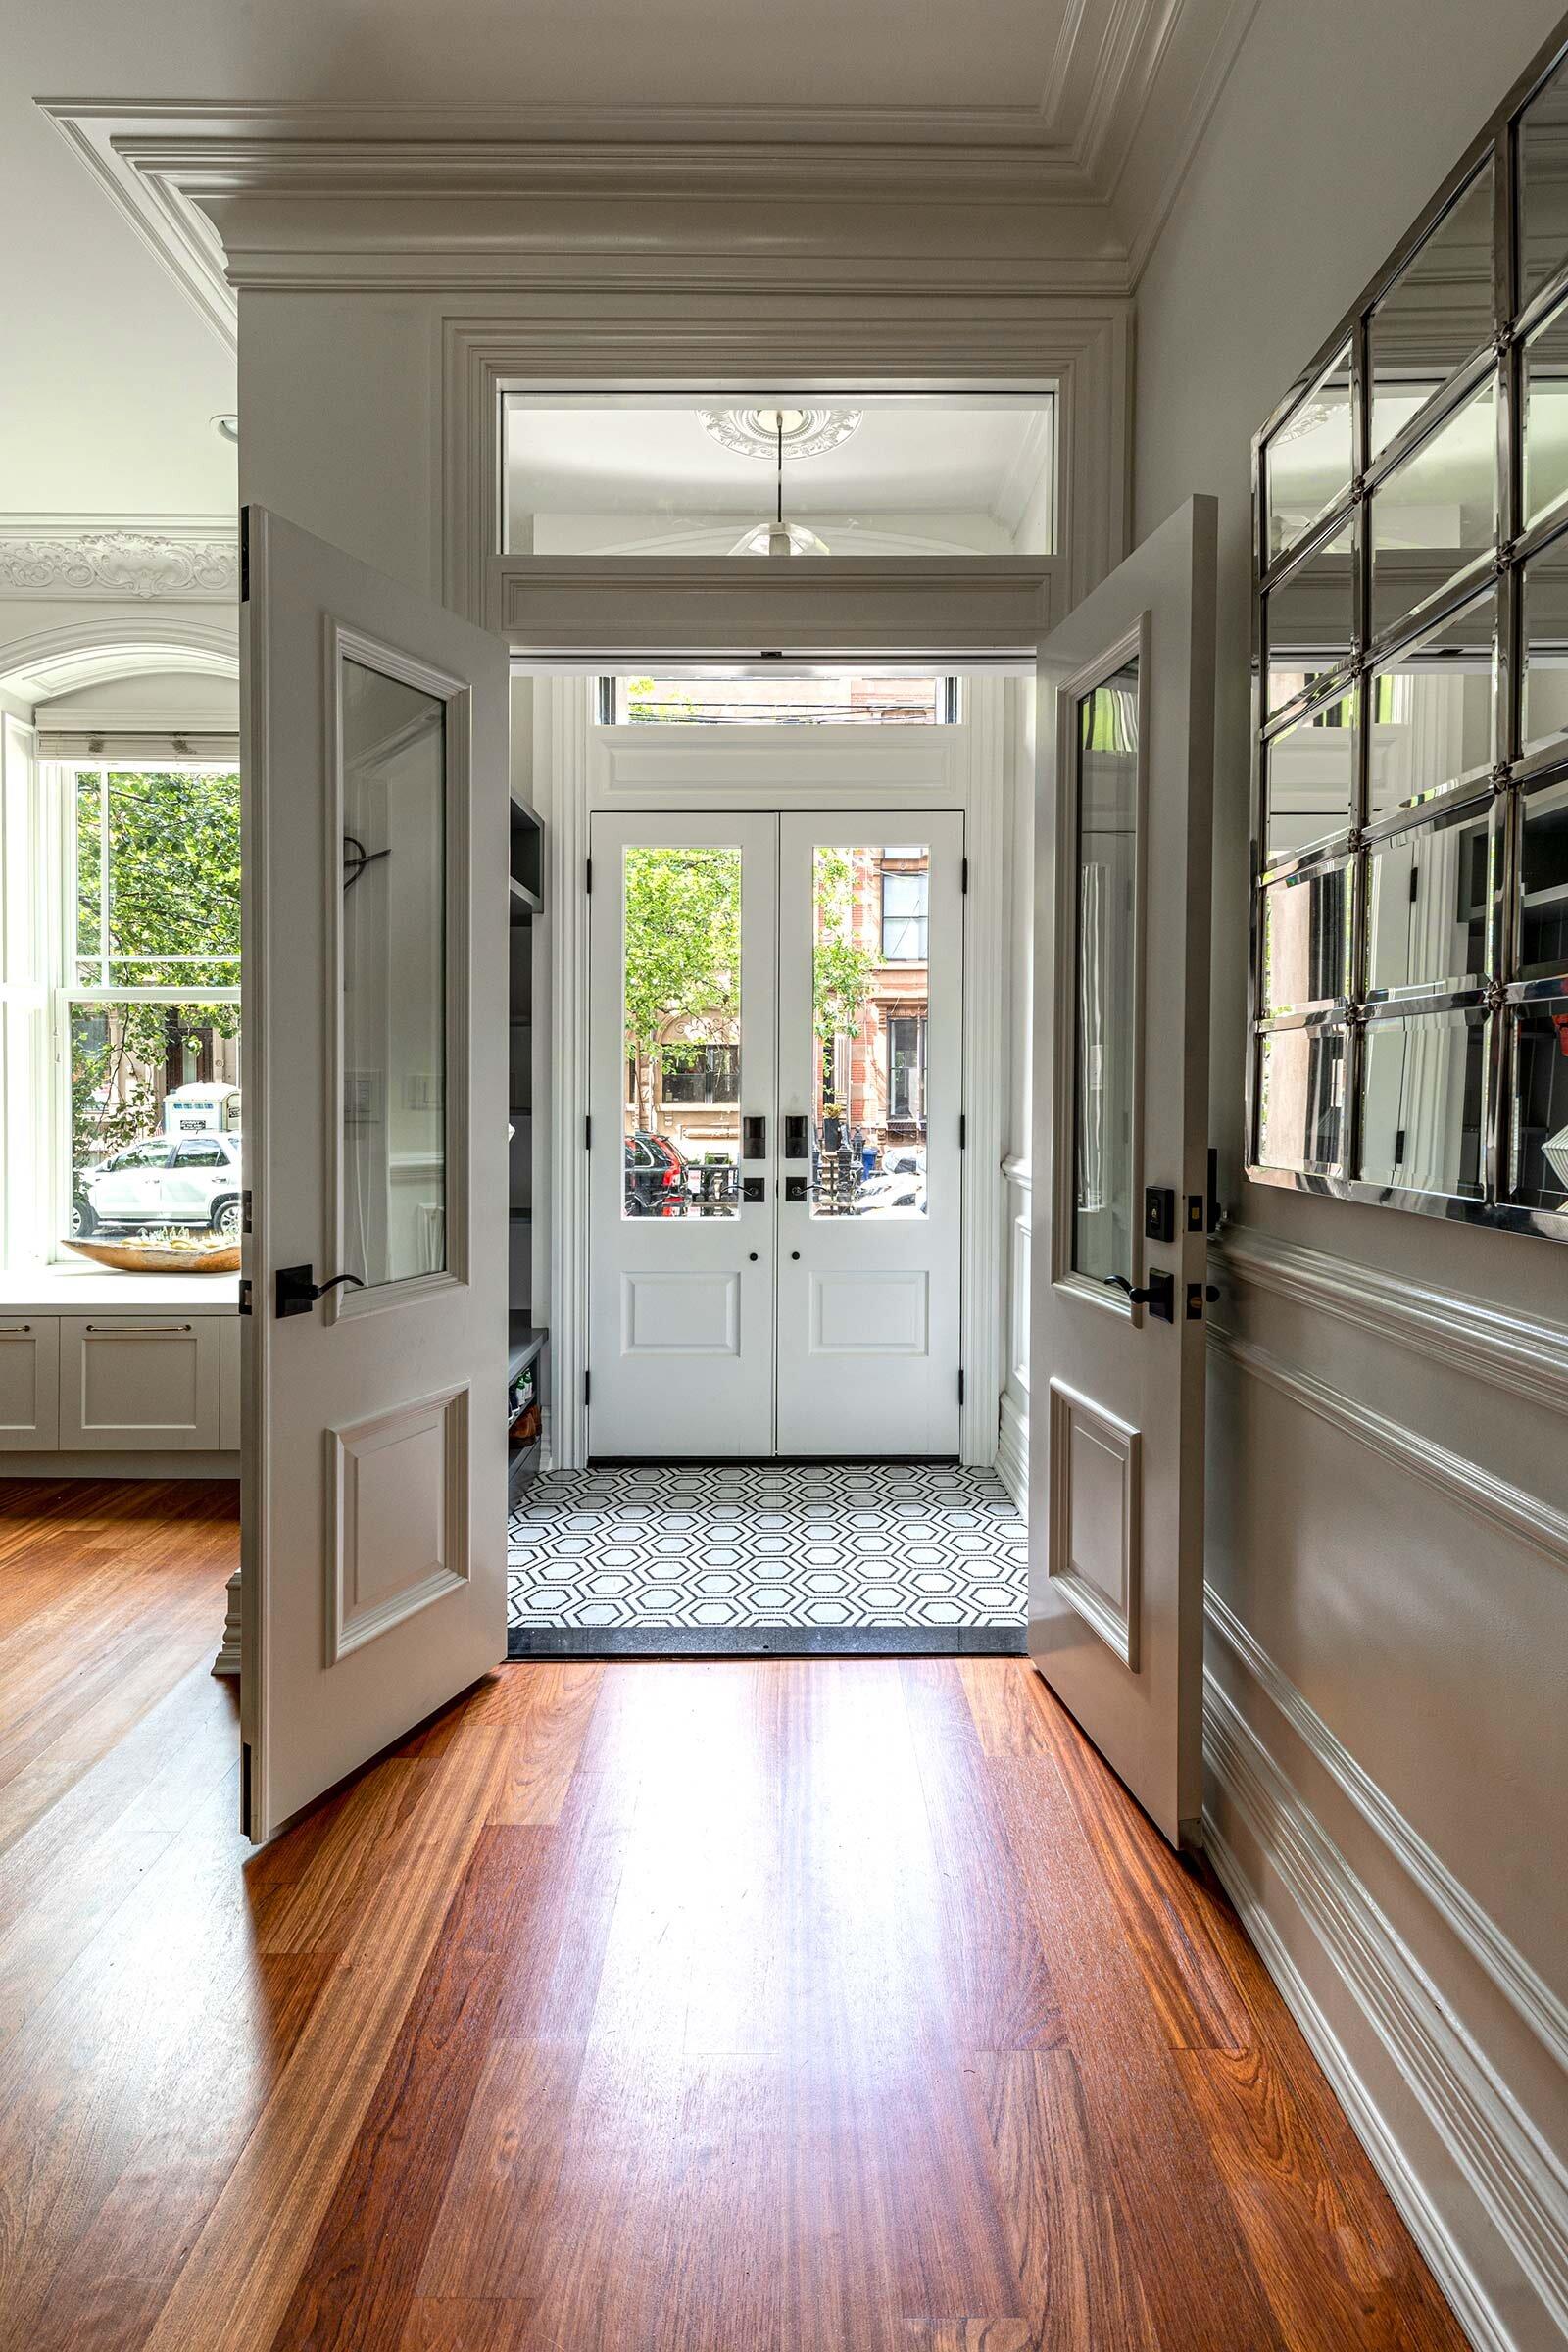 thompson-home-renovations-contractor-mudroom-vestibule-doorway.jpg